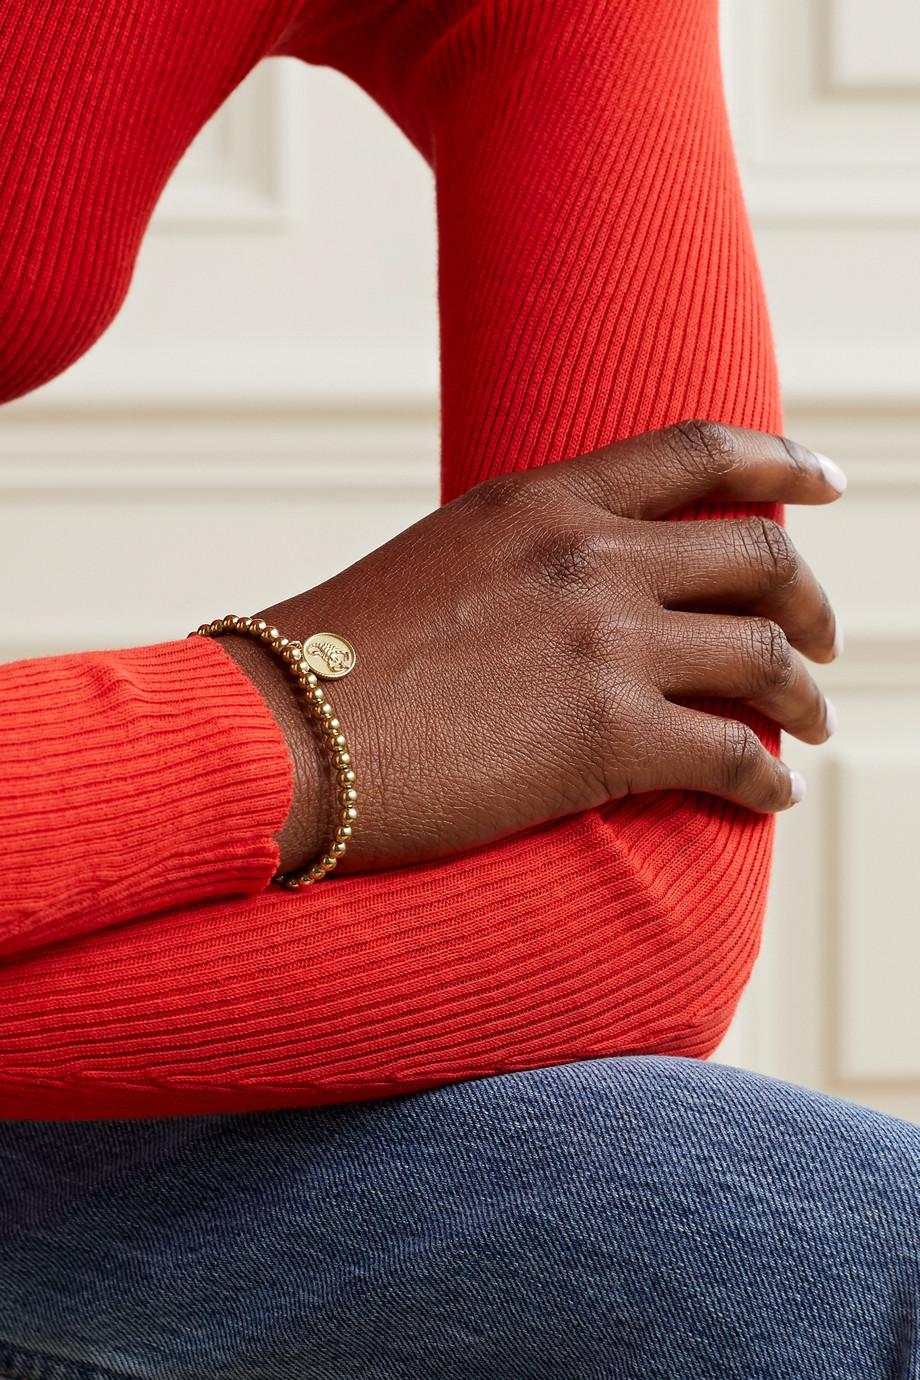 Sydney Evan Scorpio 14-karat gold diamond bracelet